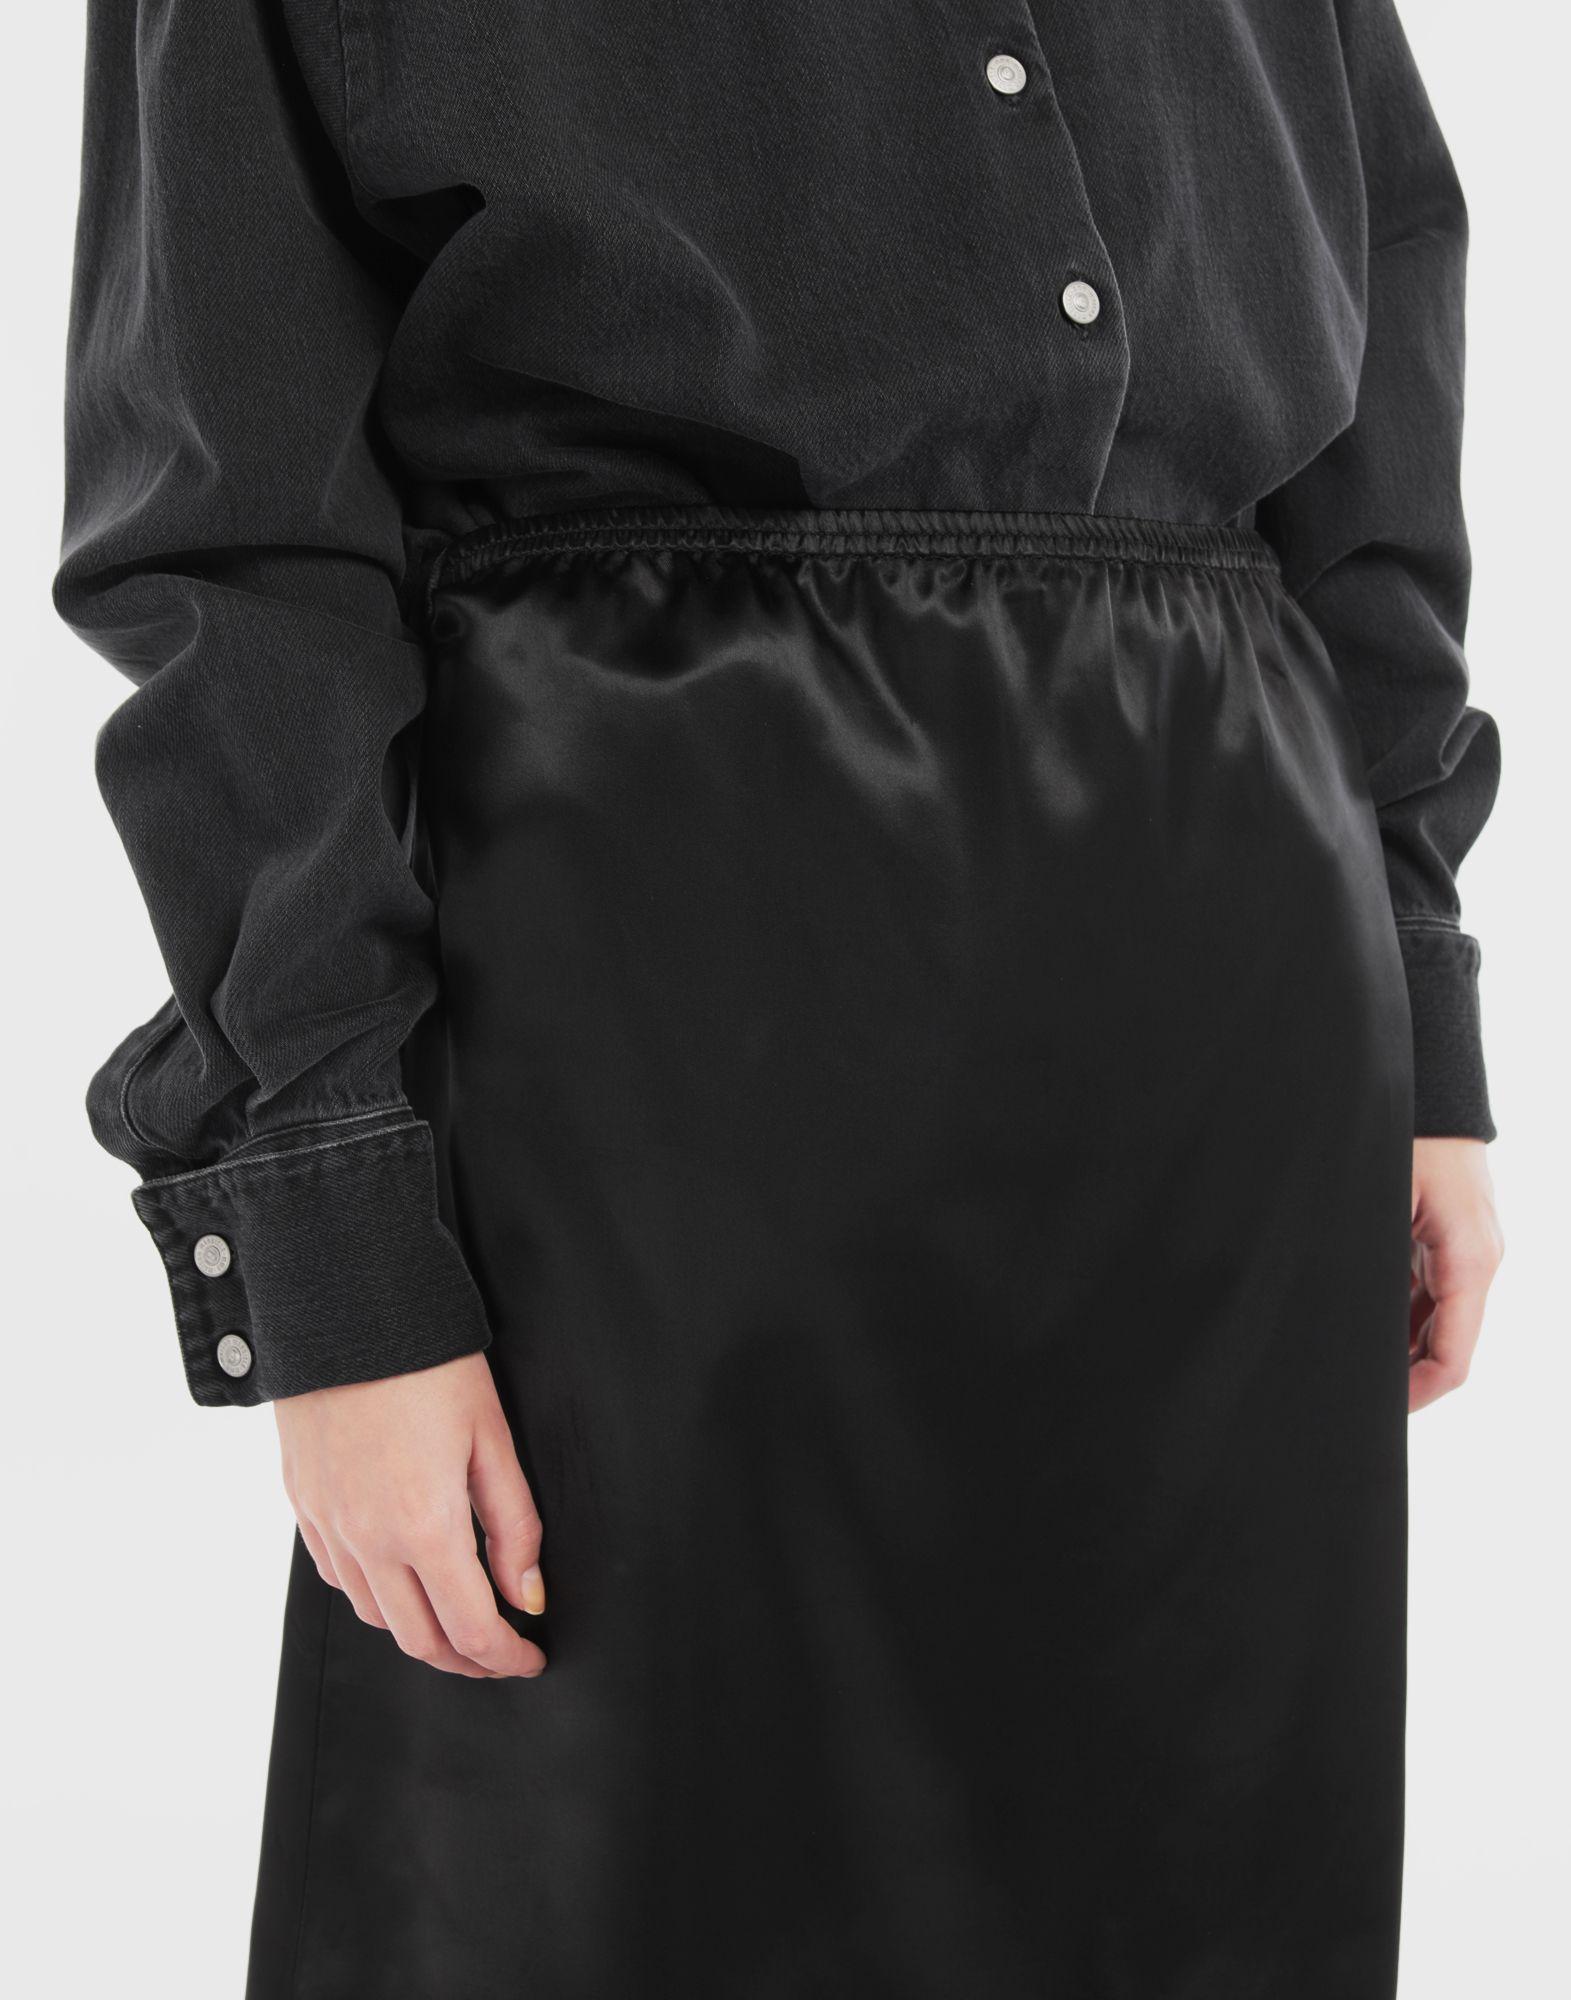 MM6 MAISON MARGIELA Chemisier Spliced multi-wear Vestito Donna b